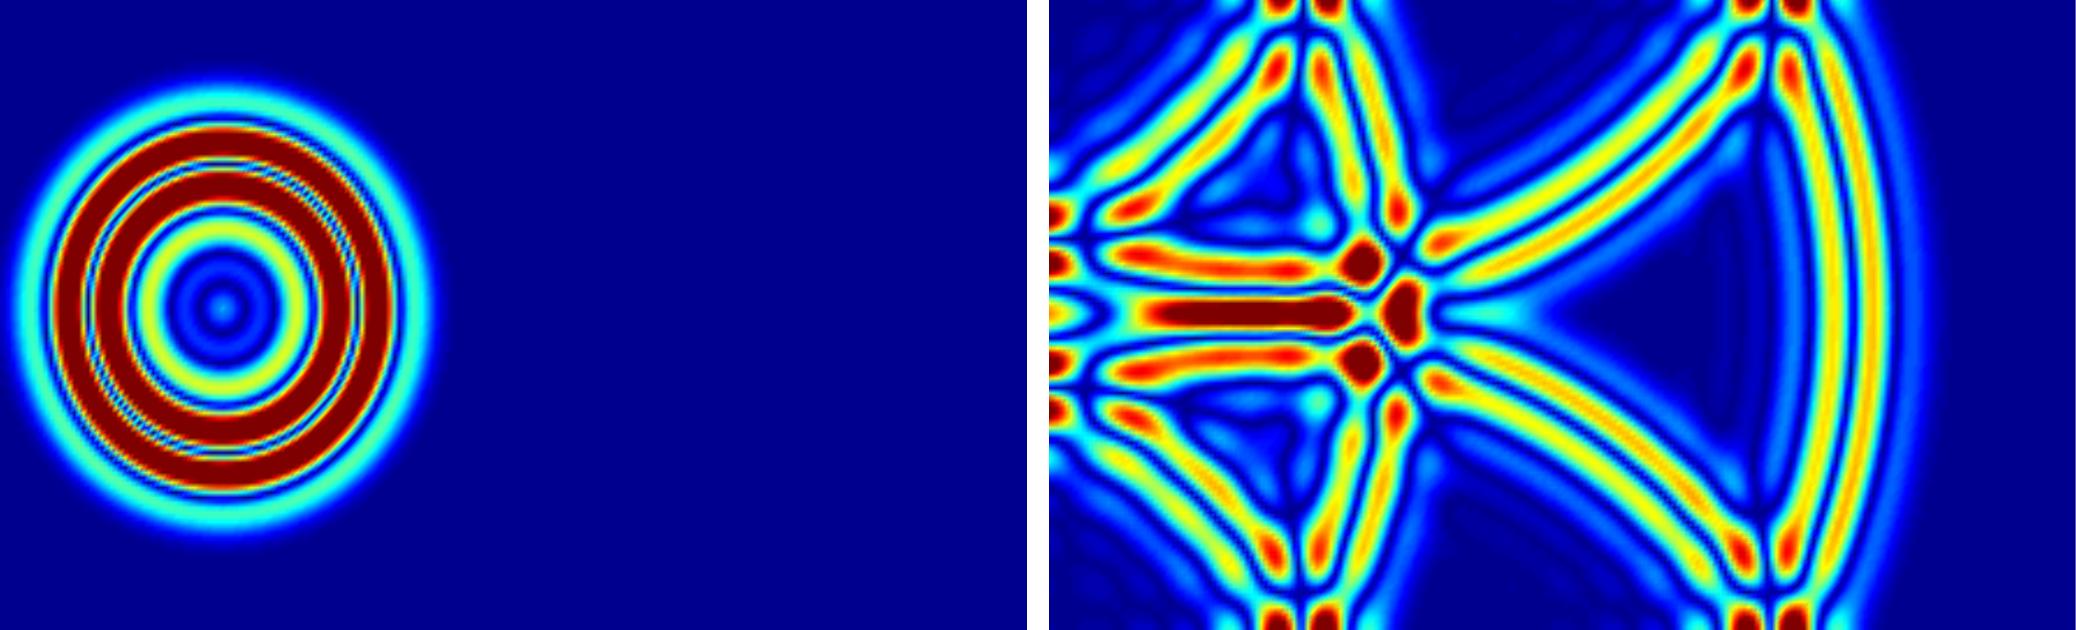 Simulatie geluidsgolven